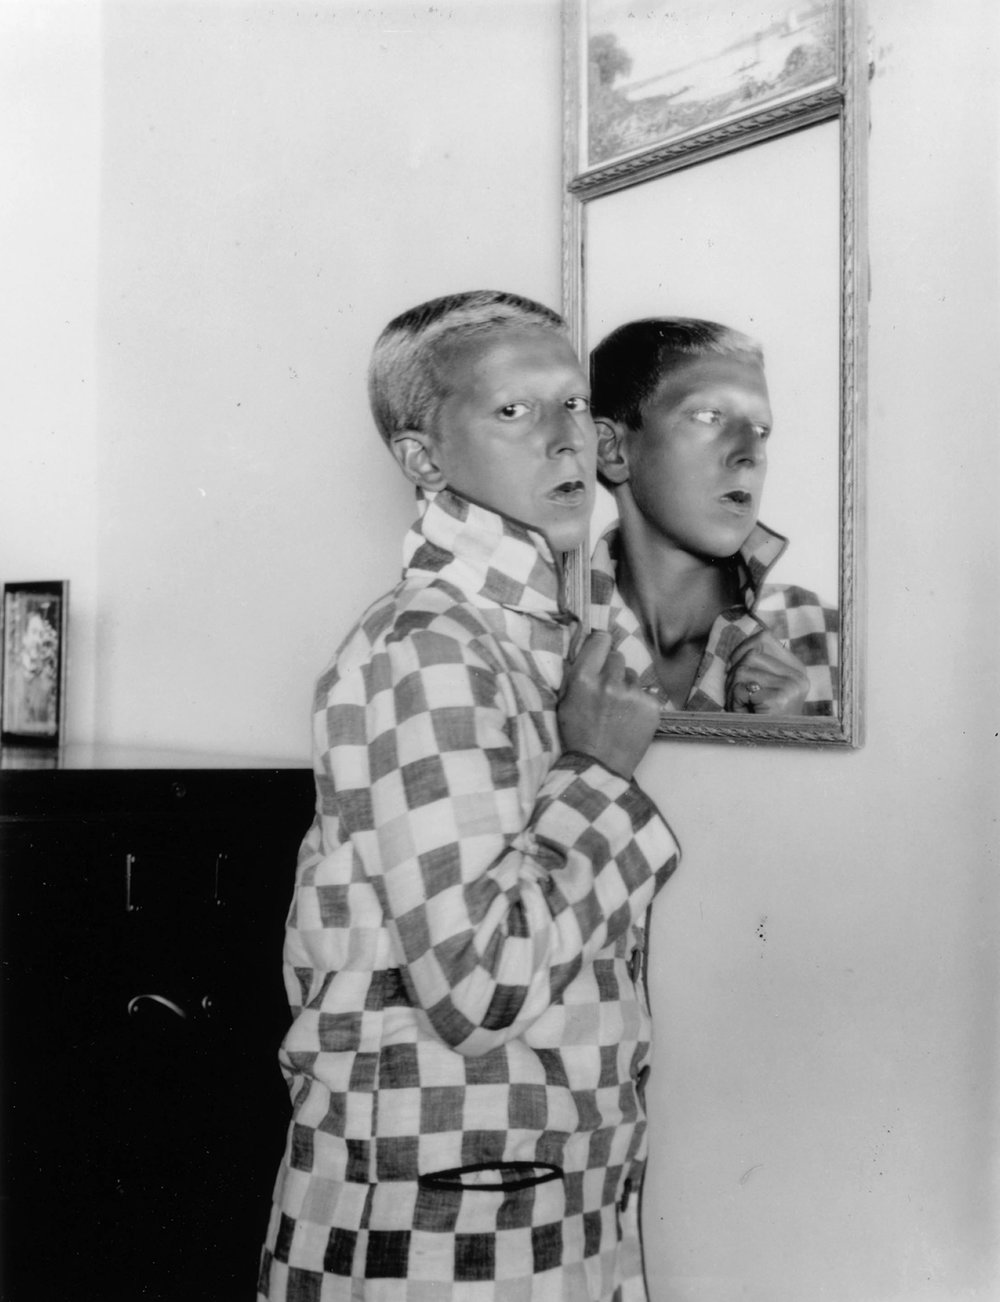 Claude Cahun, Self-Portrait, 1928.